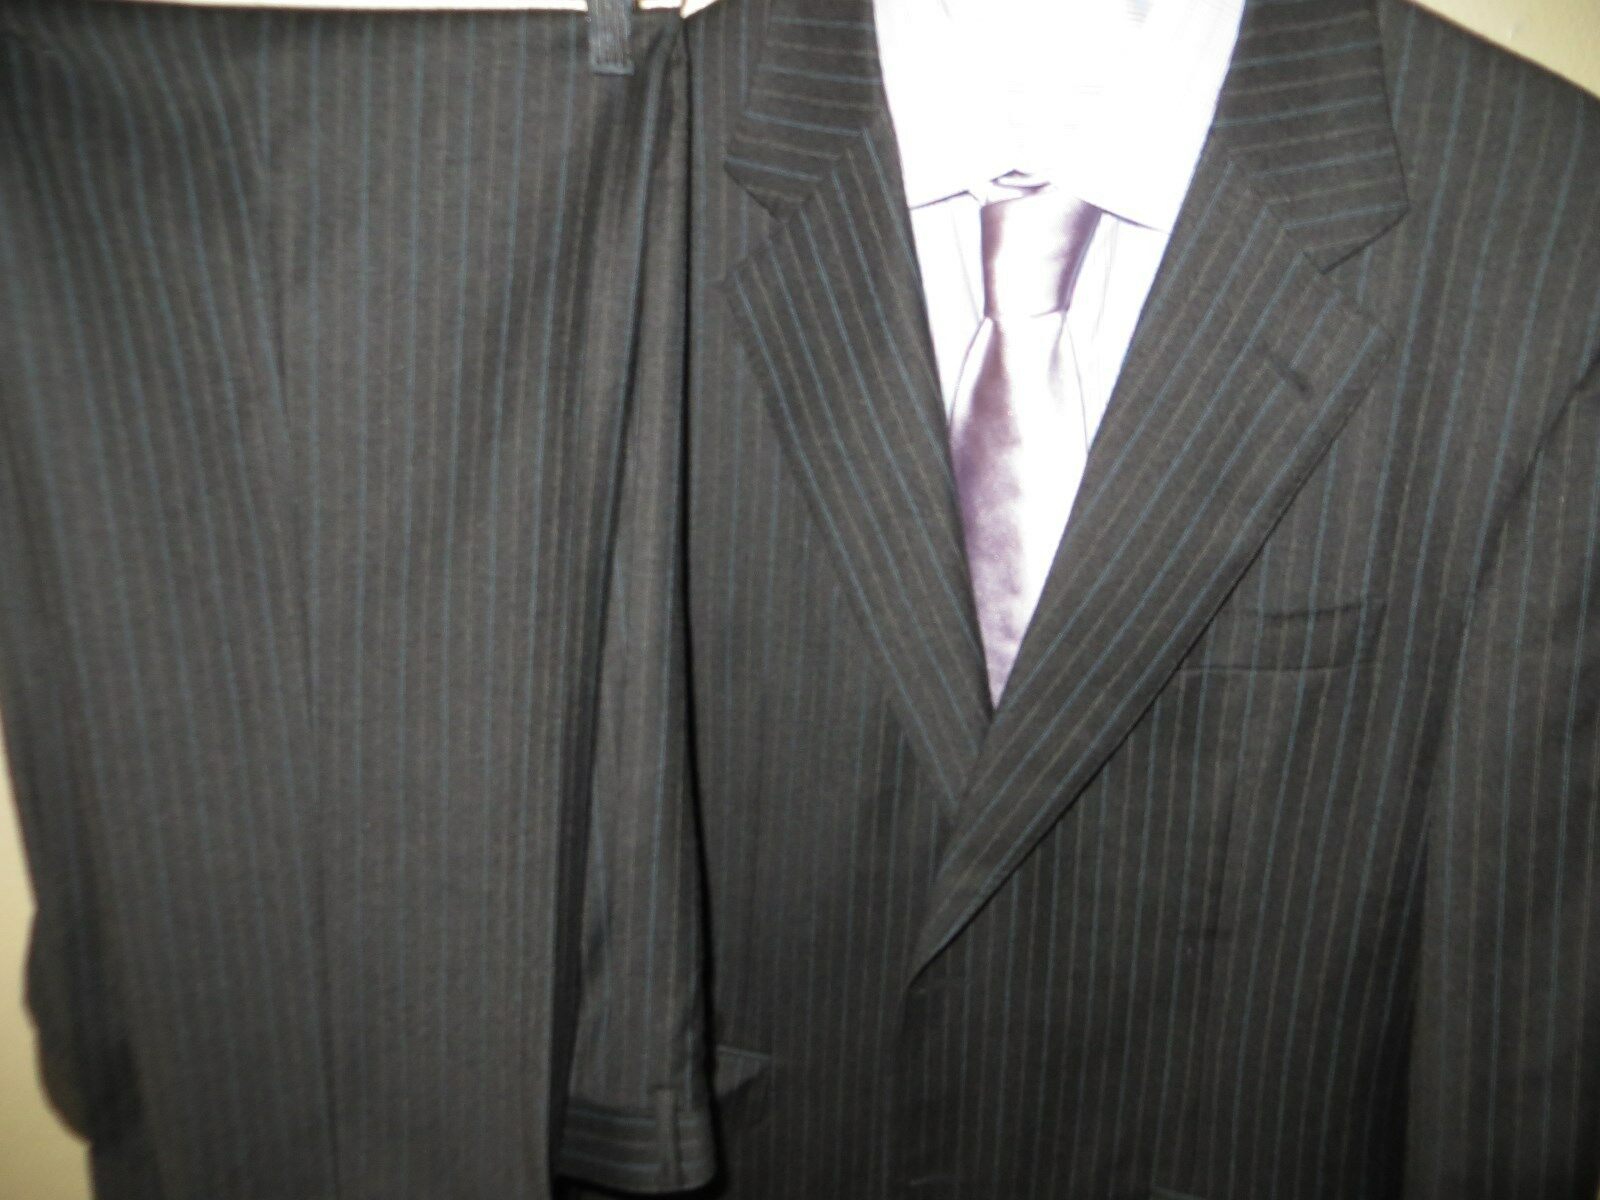 Canali Proposta Men's bluee Pinstriped 100% Wool Suit Blazer 40 R Pants 36 X 31